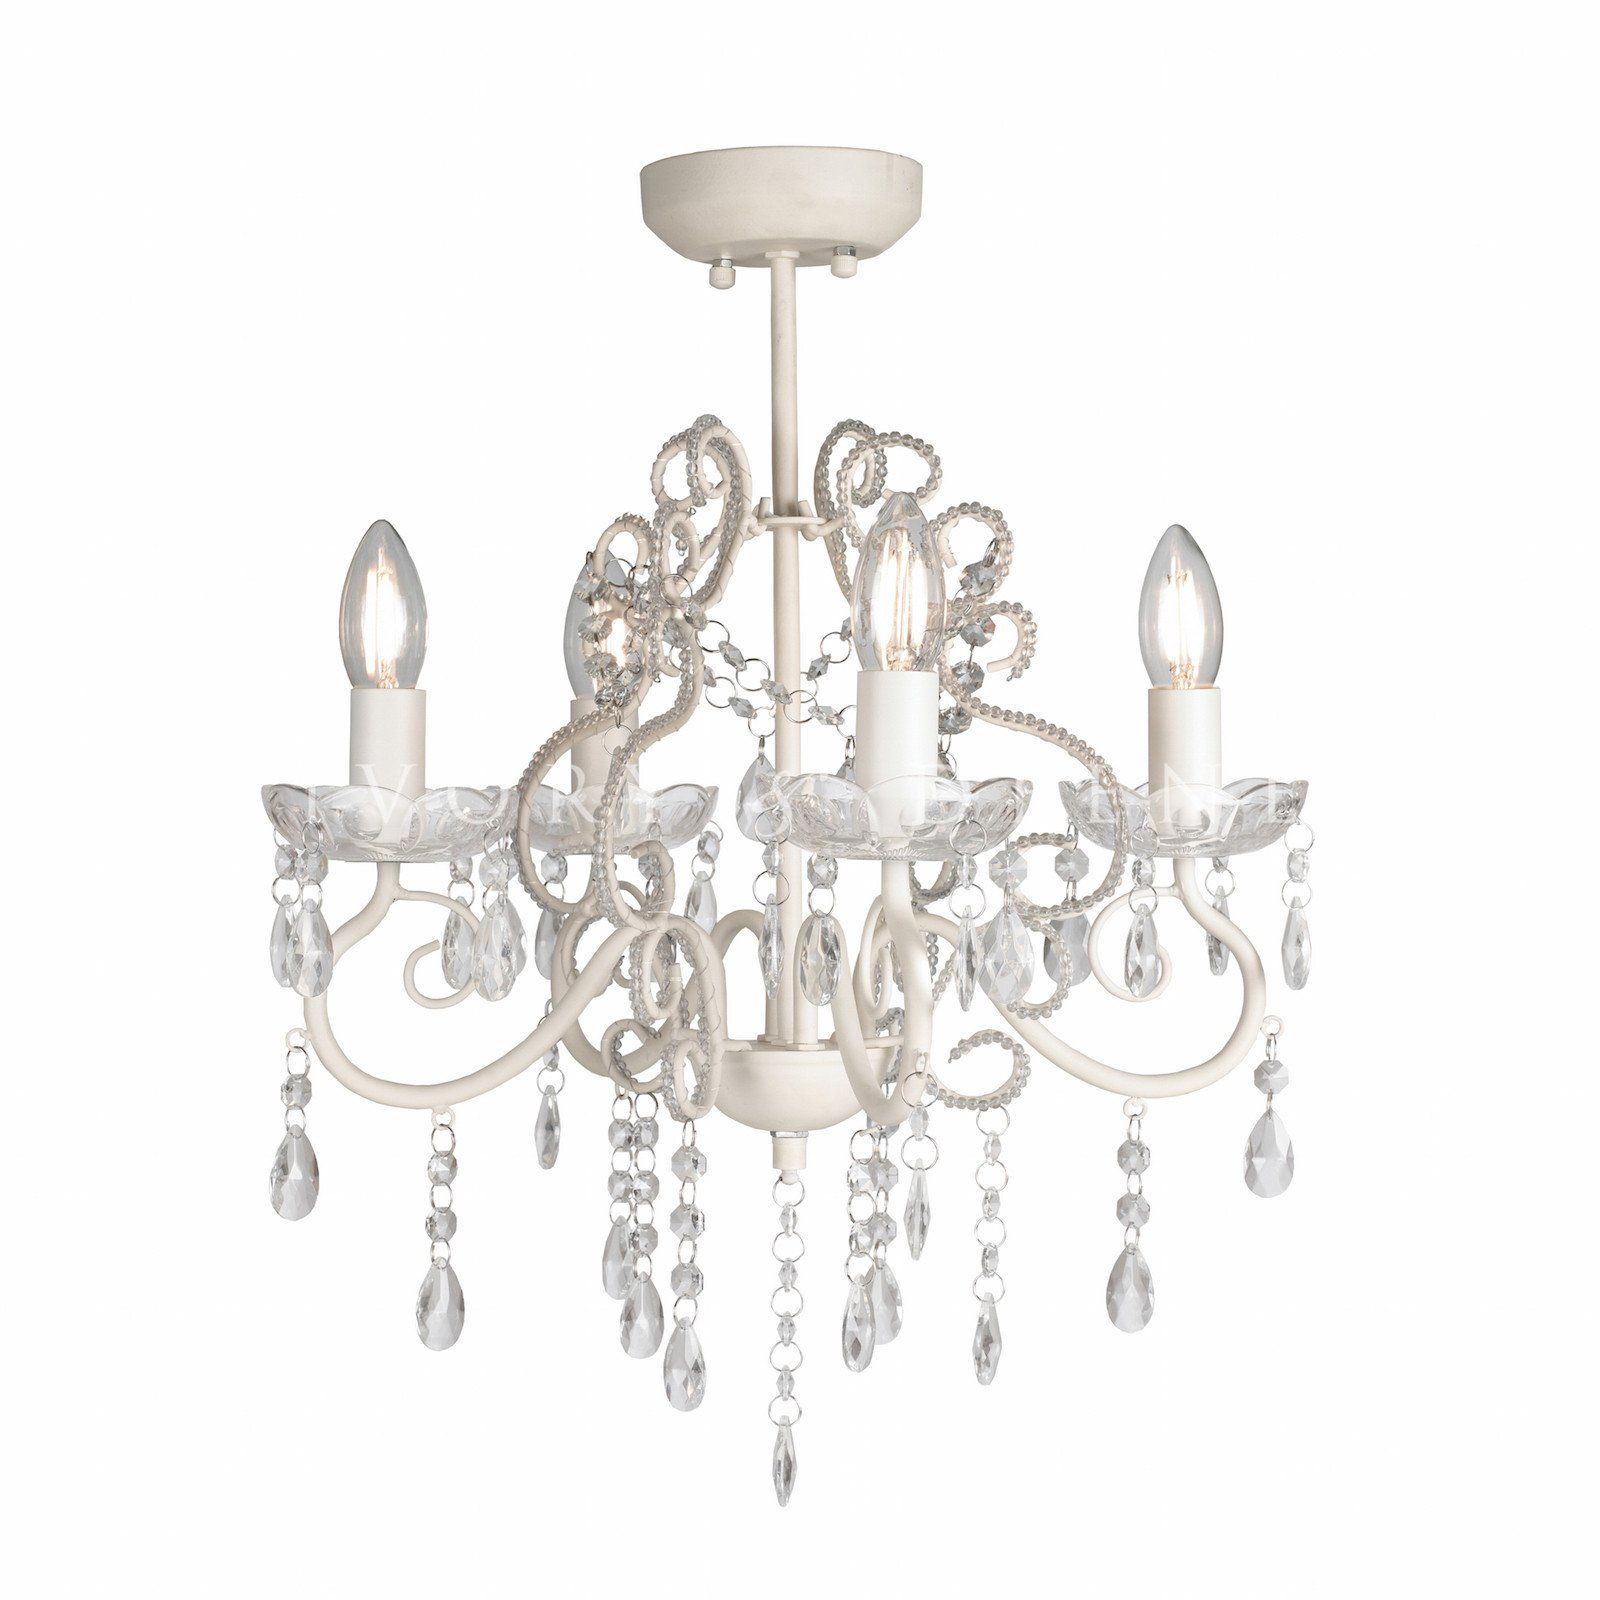 Chandelier 4 light french provincial vienna ivory deene chandelier 4 light french provincial vienna ivory deene aloadofball Gallery